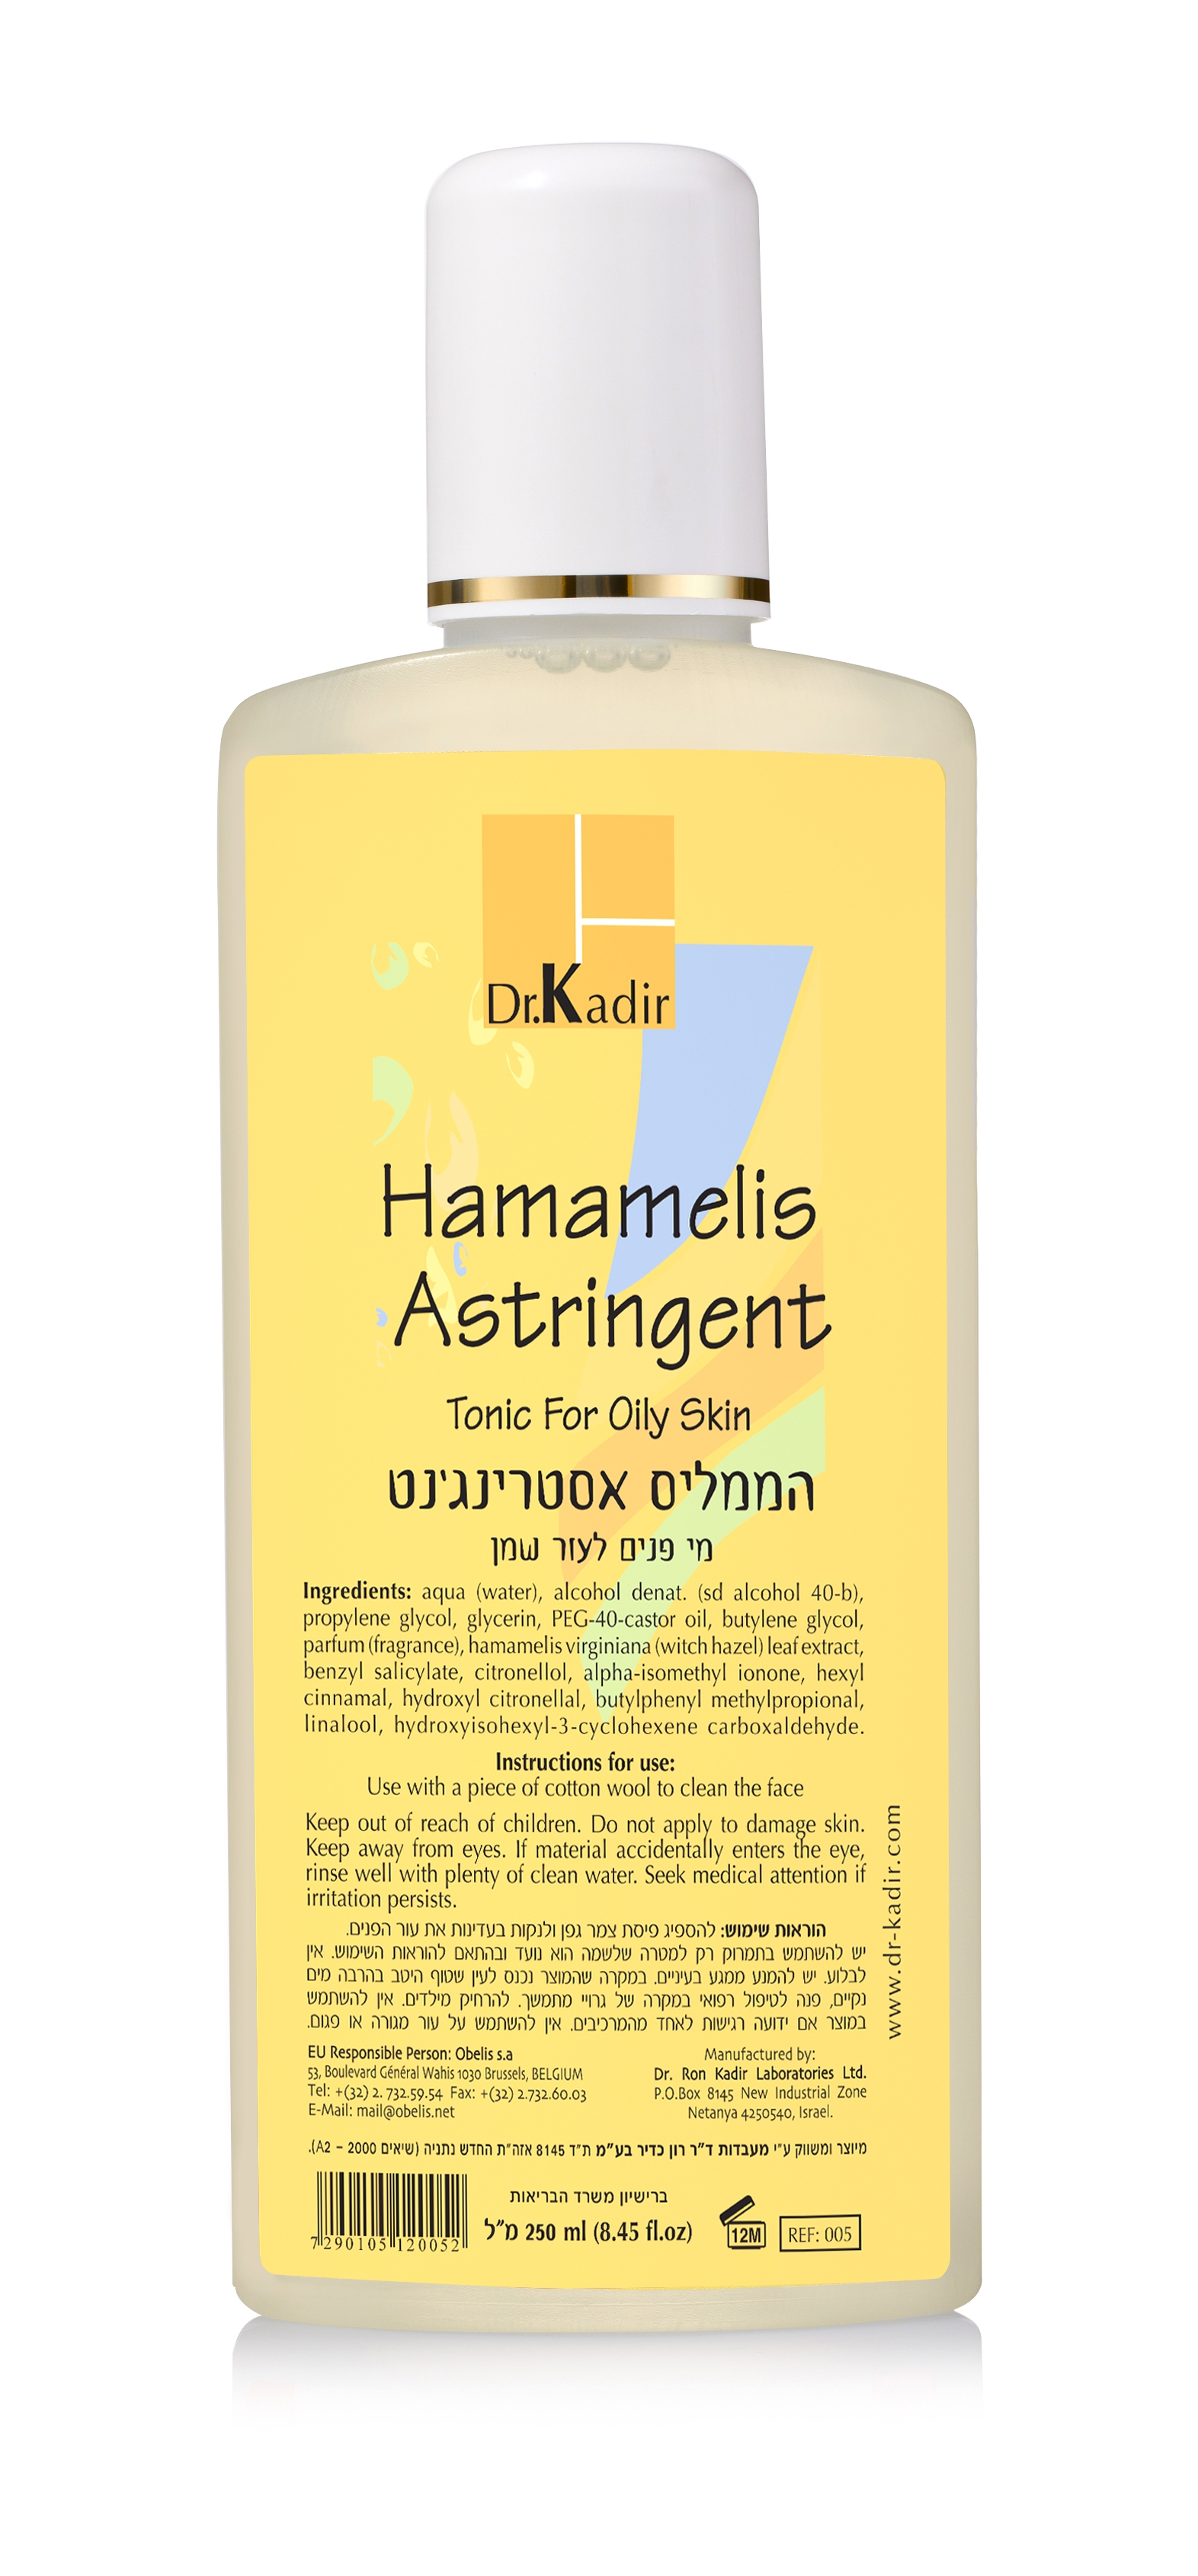 Dr.Kadir Тоник с Гамамелисом для Жирной Кожи Astringent-Hamamelis Tonic For Oily Skin, 250 мл janssen dry skin radiant firming tonic